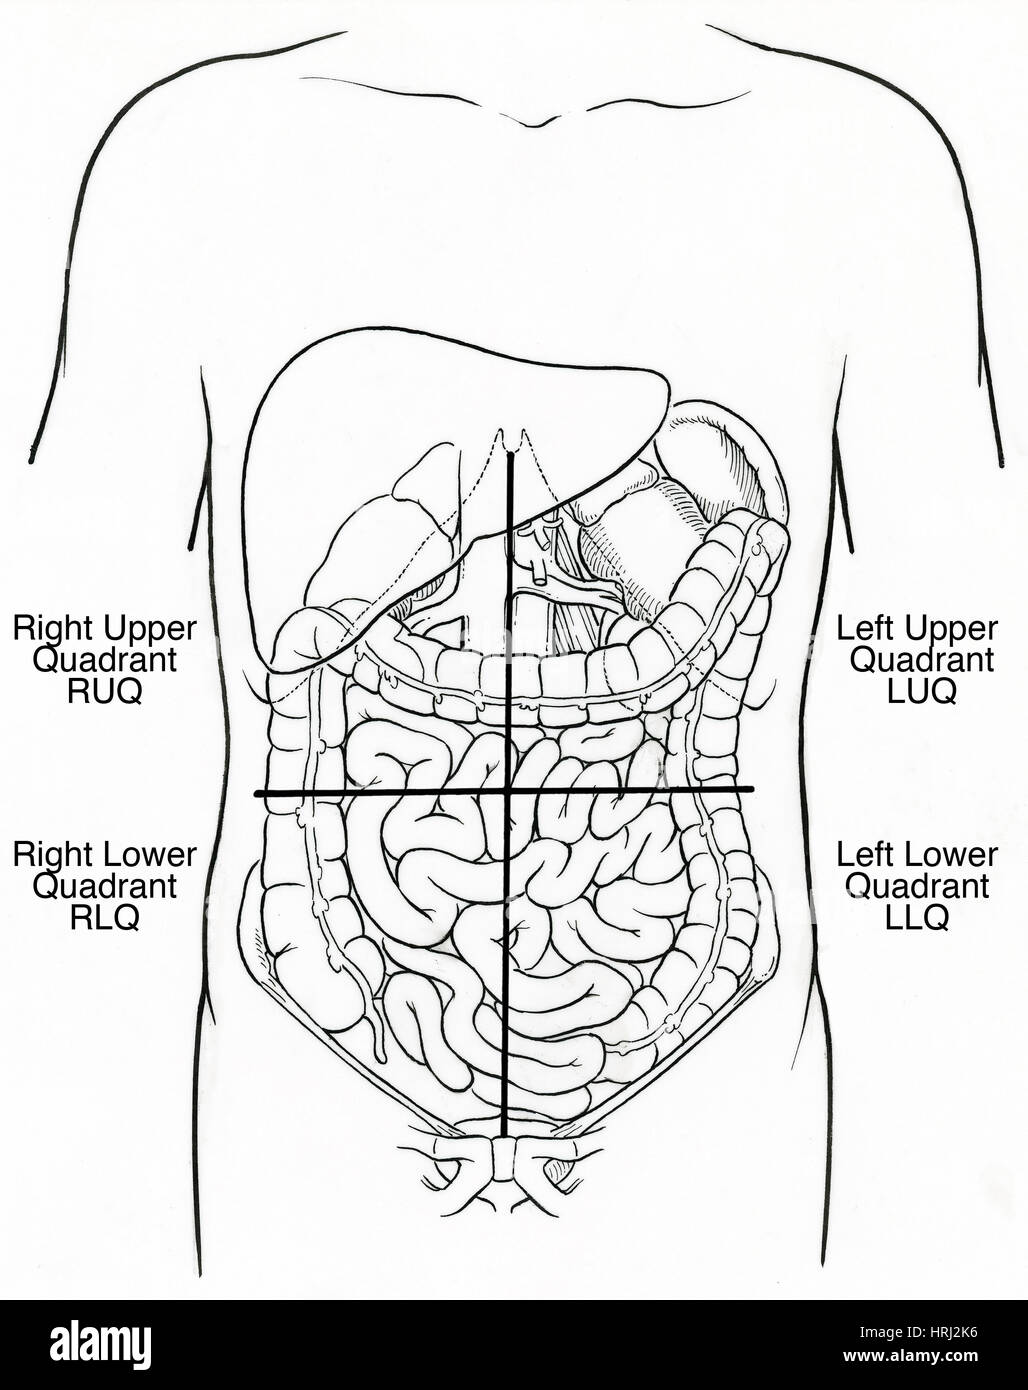 diagram of the four quadrants 1965 vw bus wiring illustration abdominal stock photo royalty